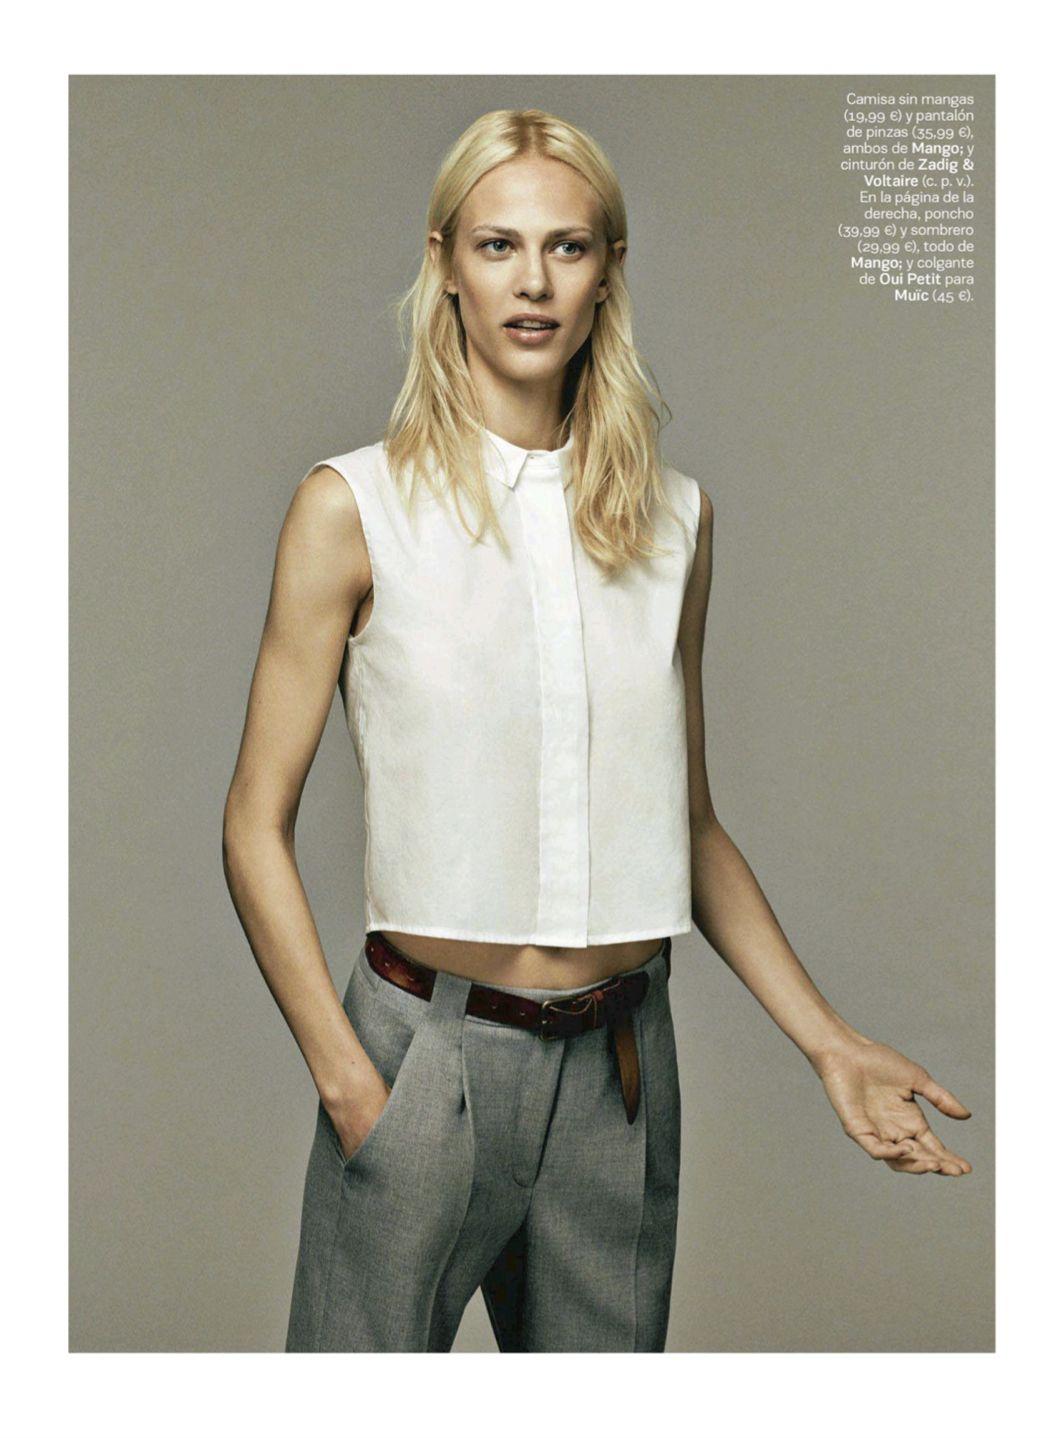 S Moda August 2014   Aymeline Valade by Damon Baker [Editorial]